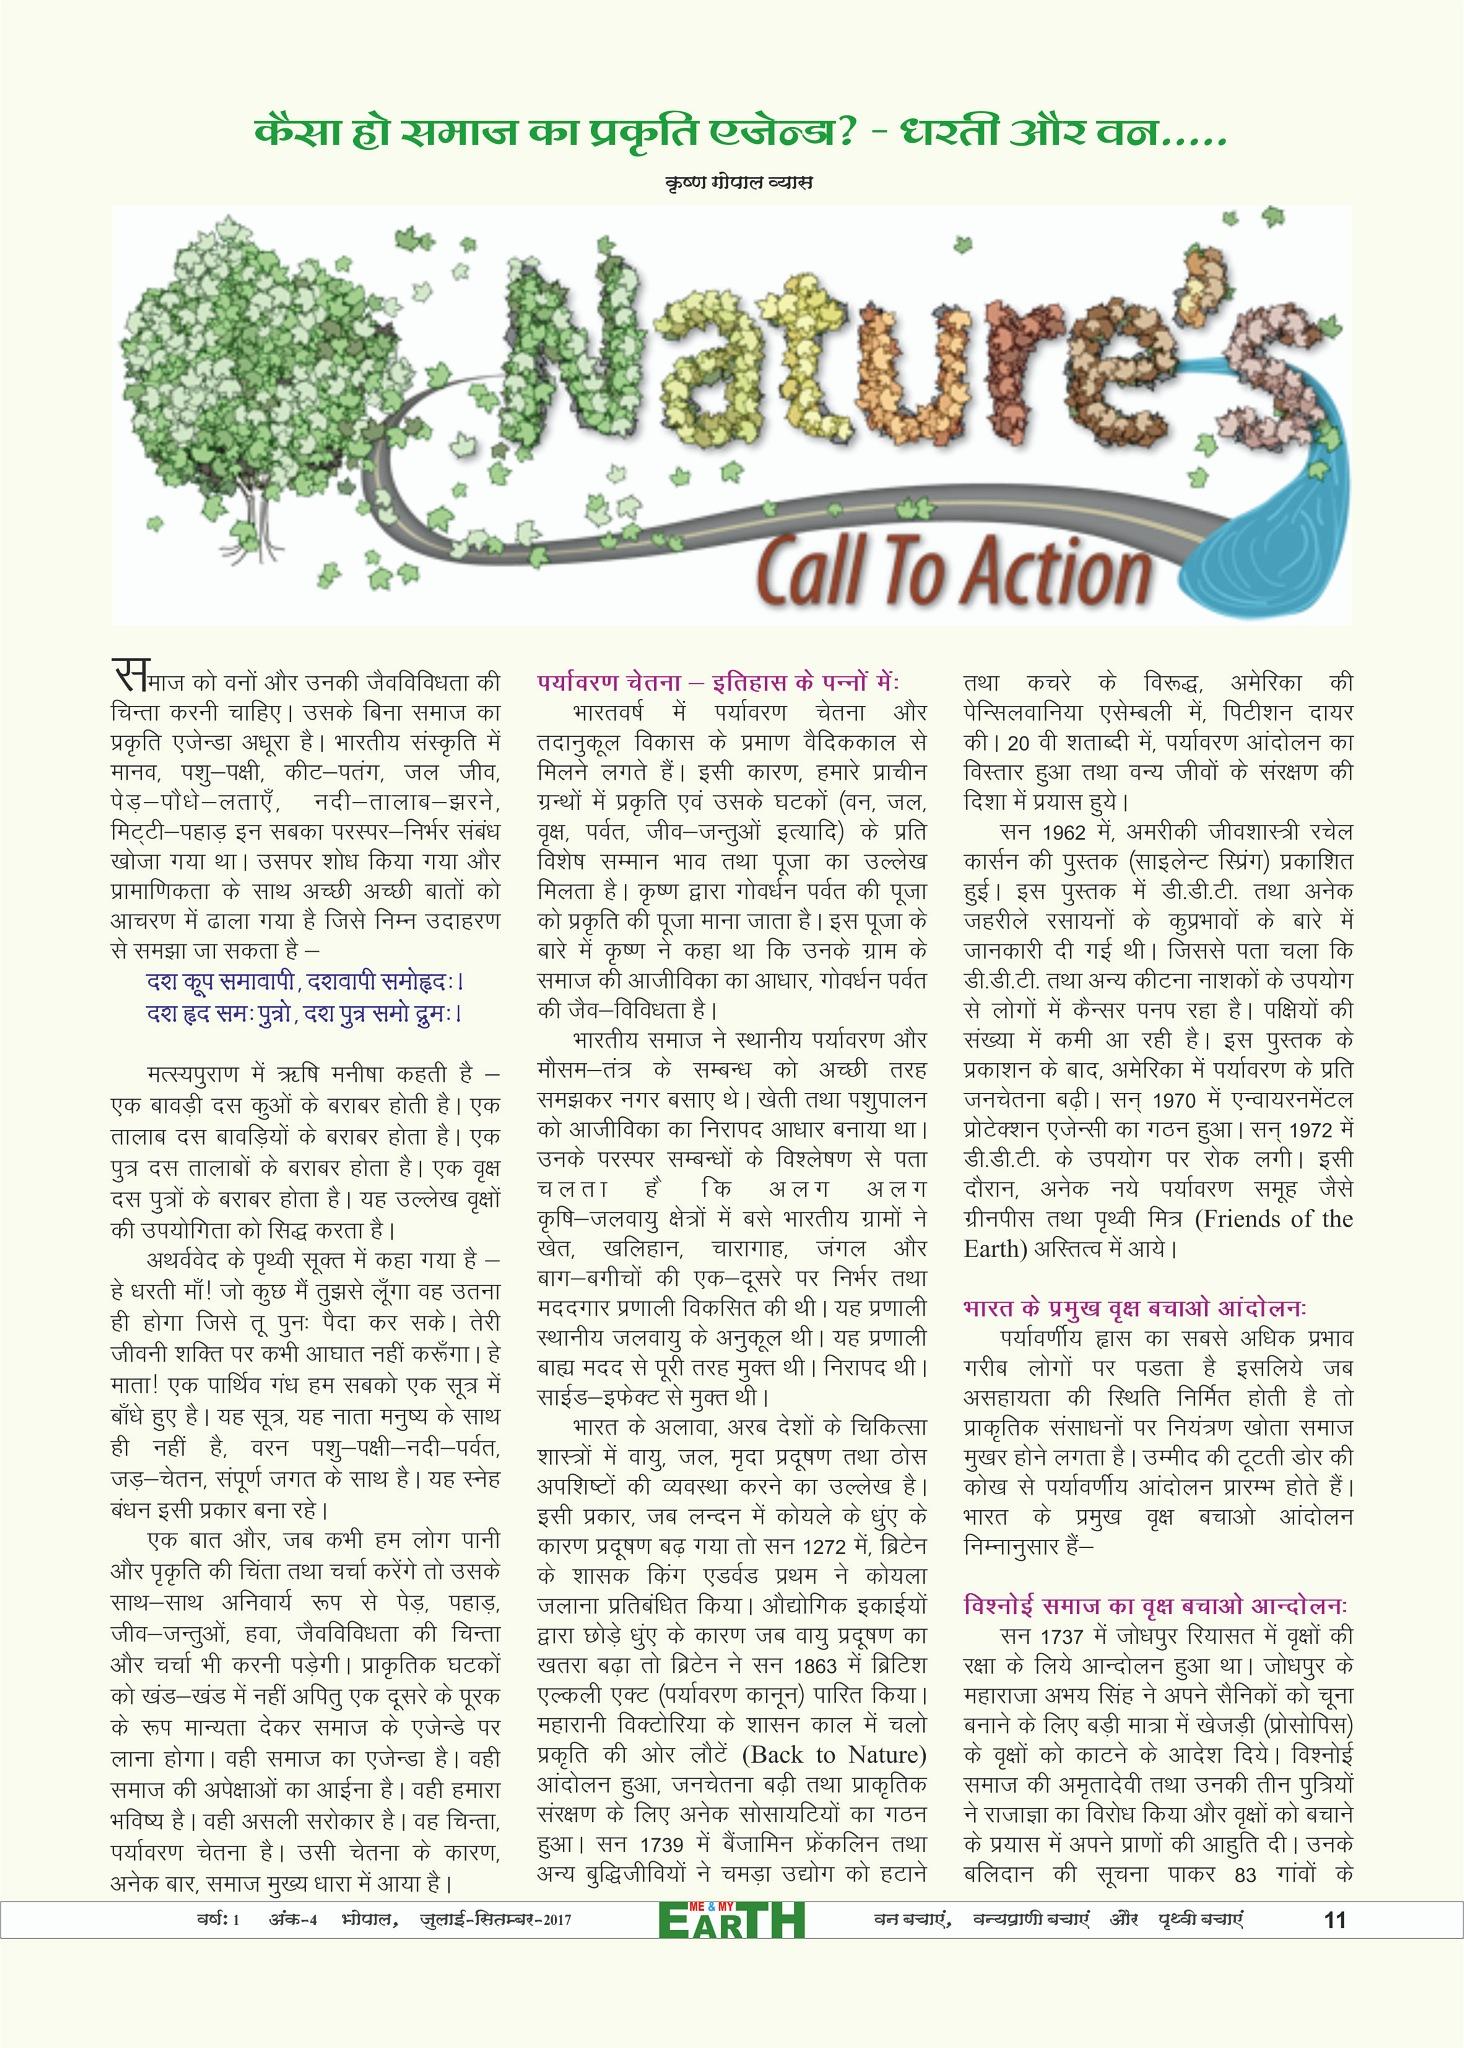 Natures' Agenda,  by Jagdish Chandra